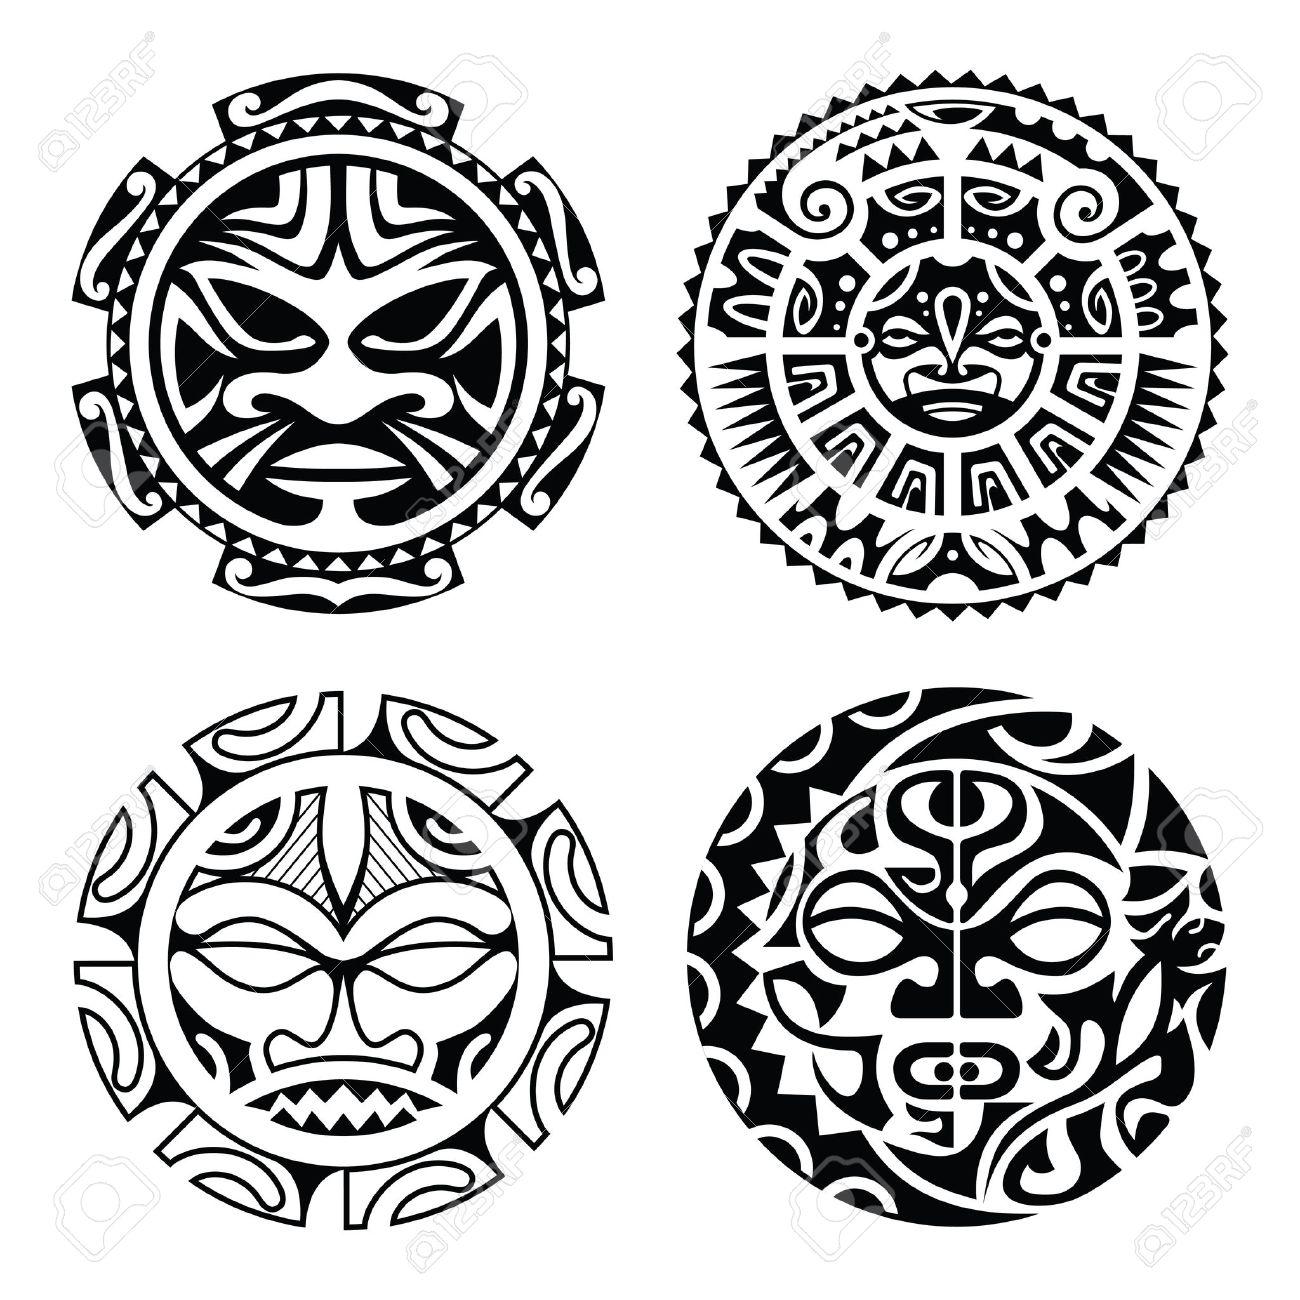 Tatuajes Maories Y Su Significado Galerie Tatouage